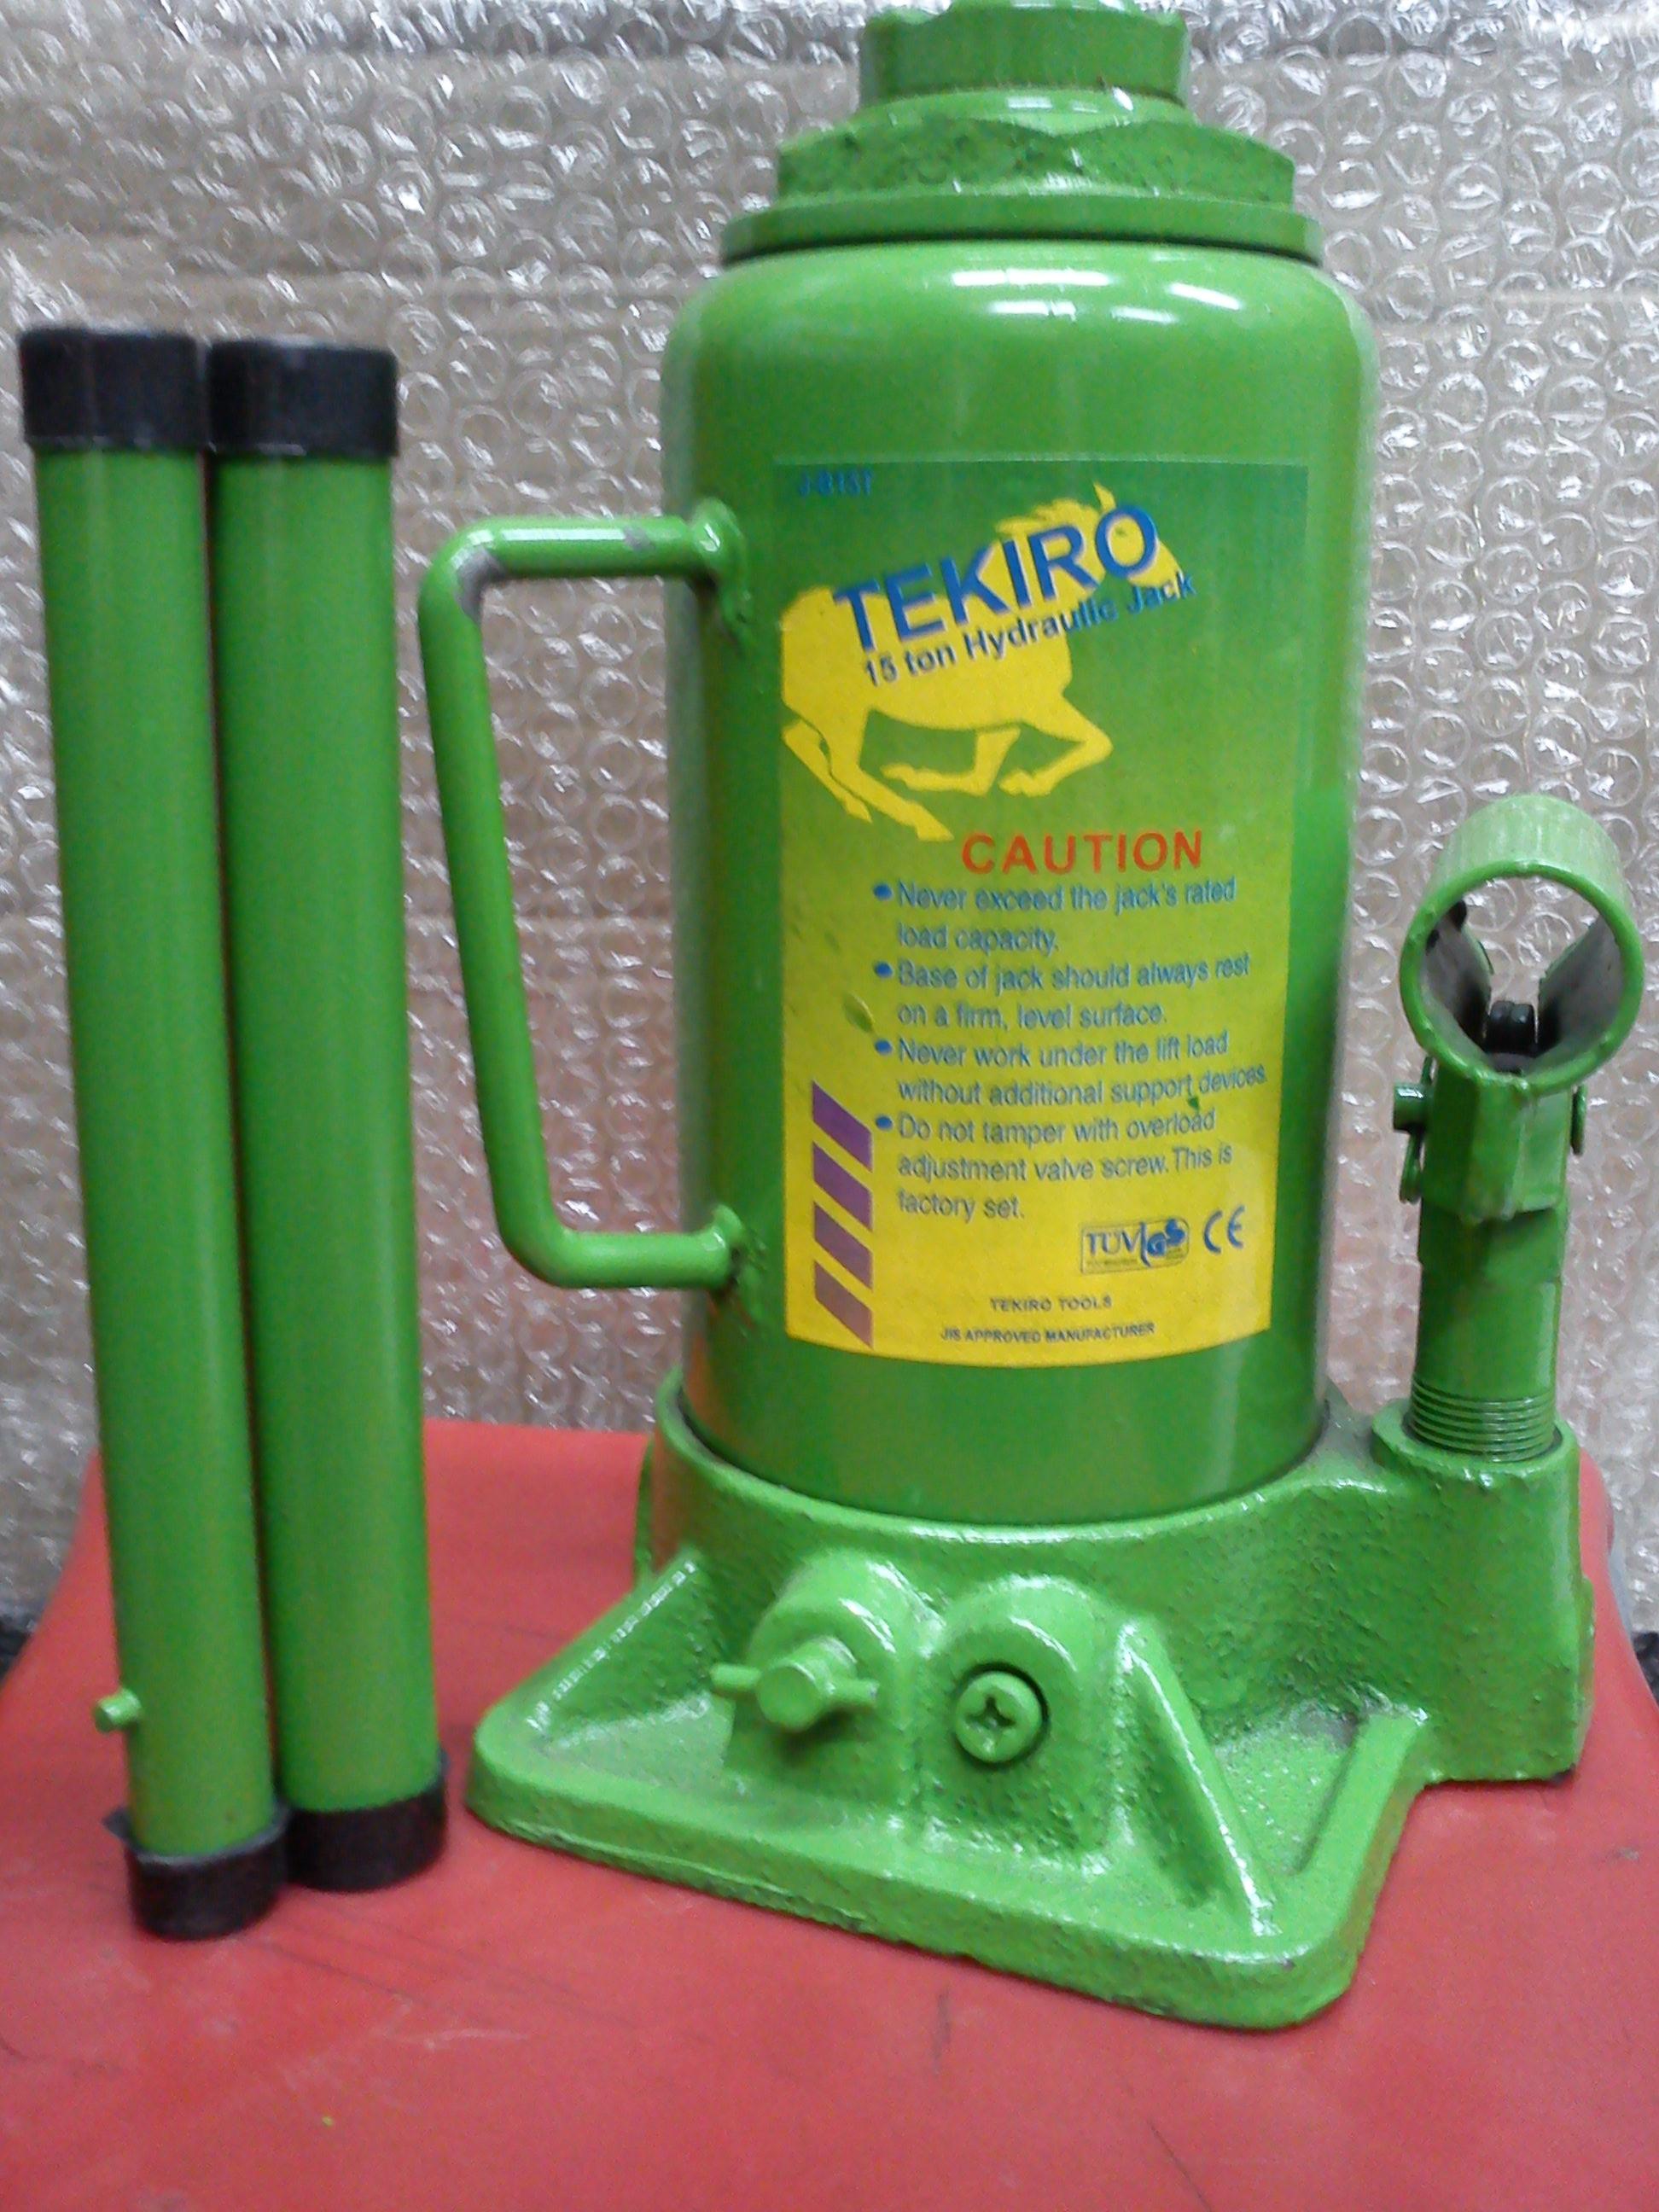 Tekiro Dongkrak Botol 20 Ton Spec Dan Daftar Harga Terbaru Indonesia 4 Mobil Jual 15 Sumber Teknik Supply